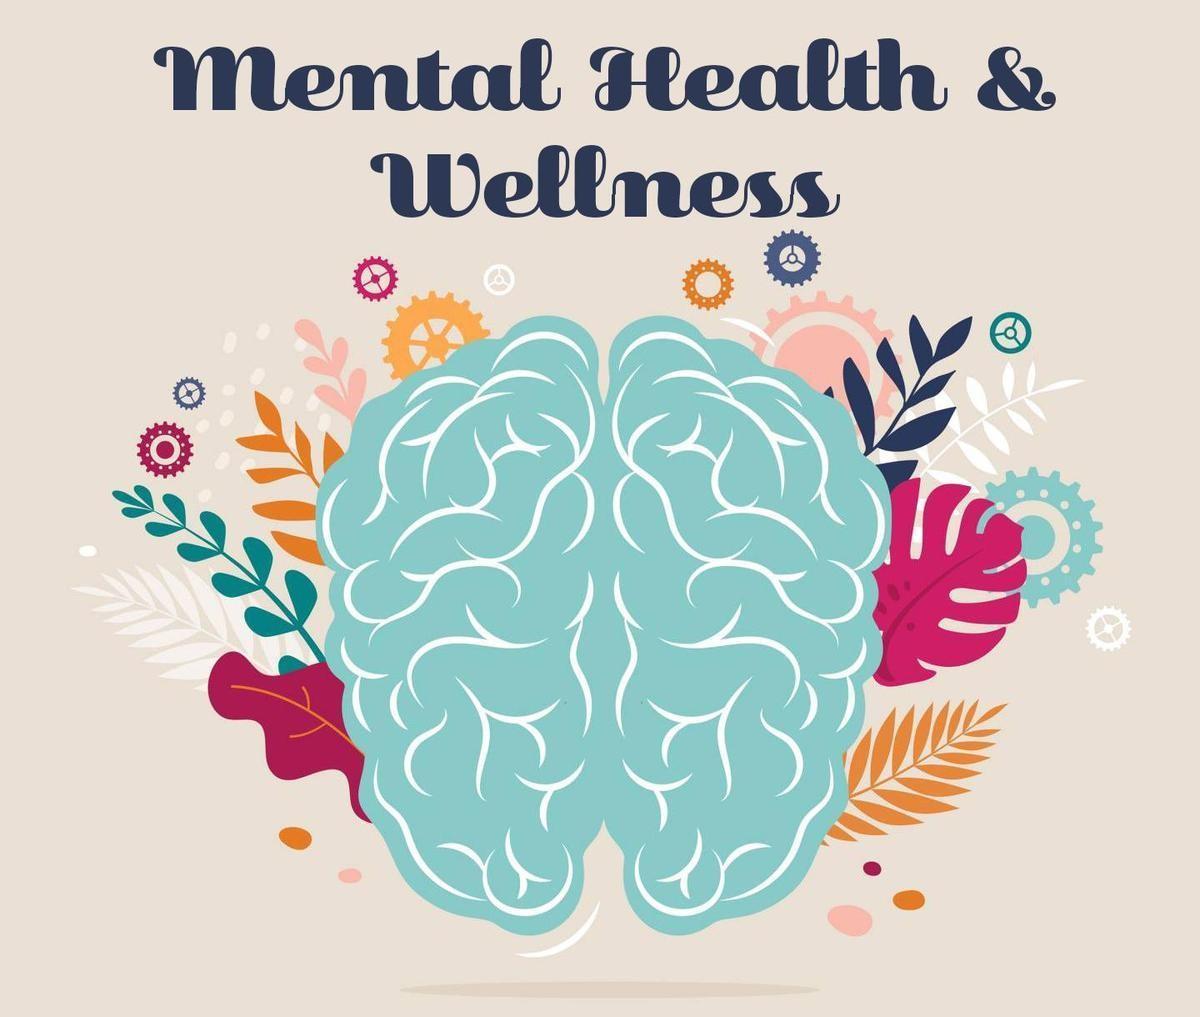 images mental health